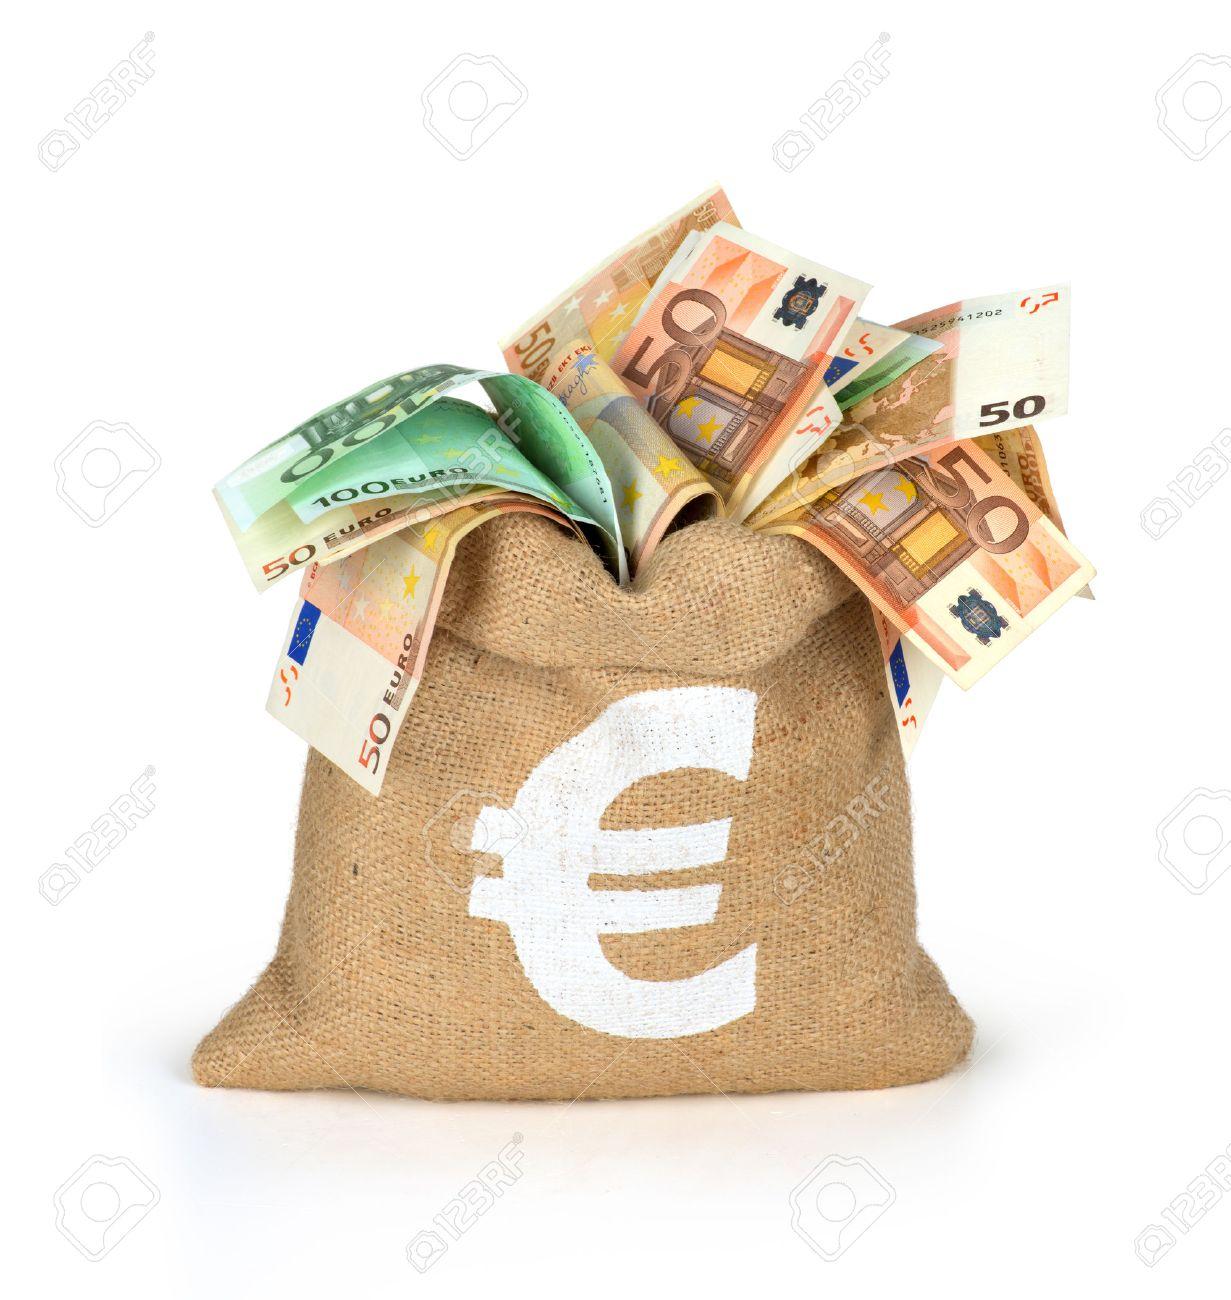 http://hrvatskifokus-2021.ga/wp-content/uploads/2018/12/44496990-bag-of-money-with-different-euro-bills.jpg